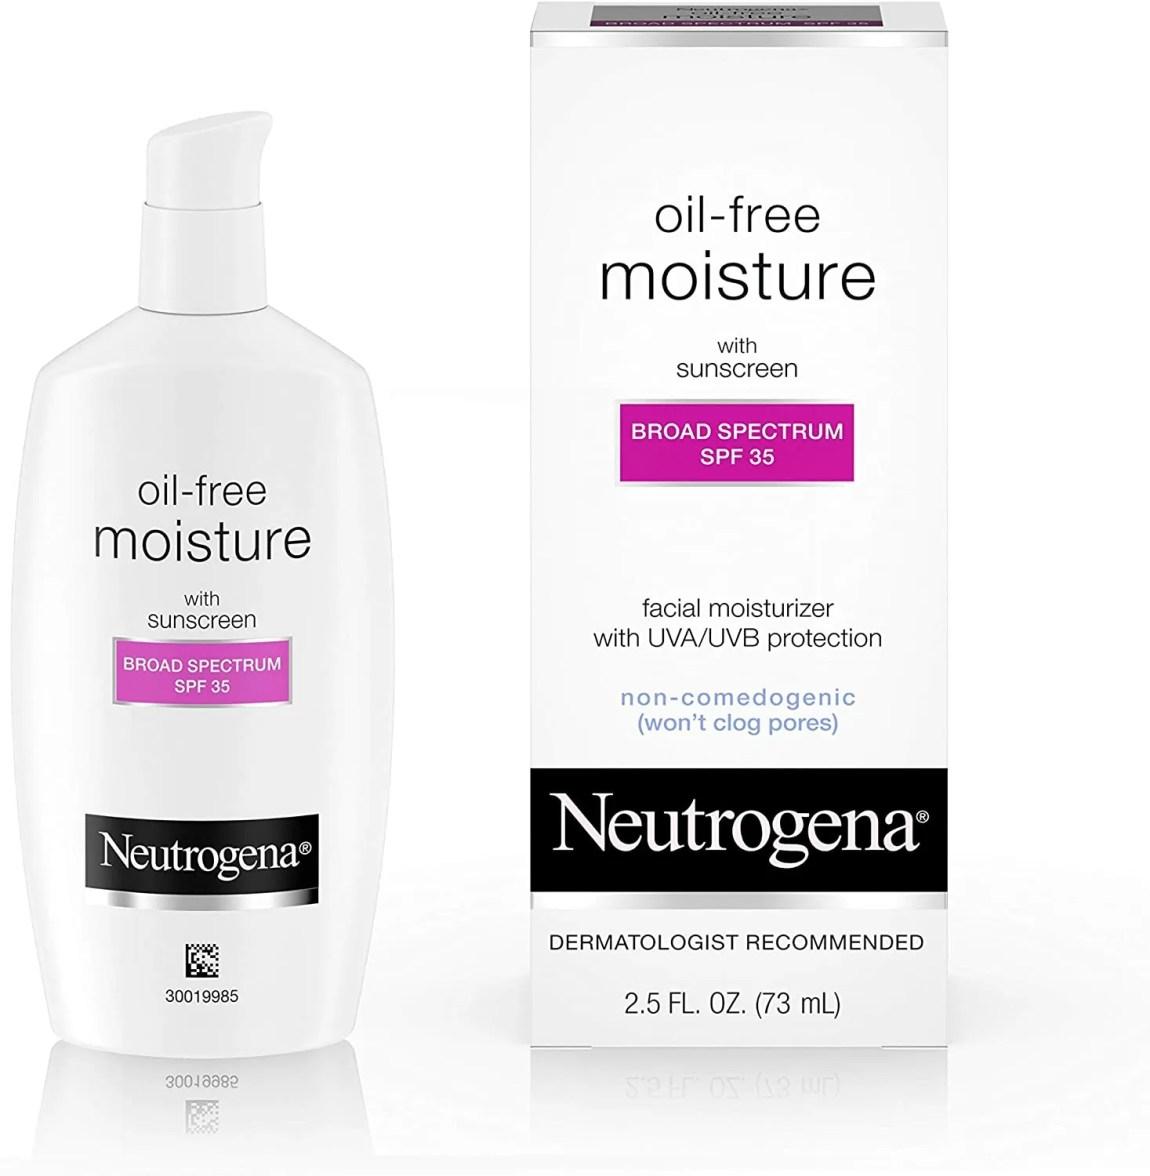 Moisturizing oil-free sunscreen 35 Neutrogena